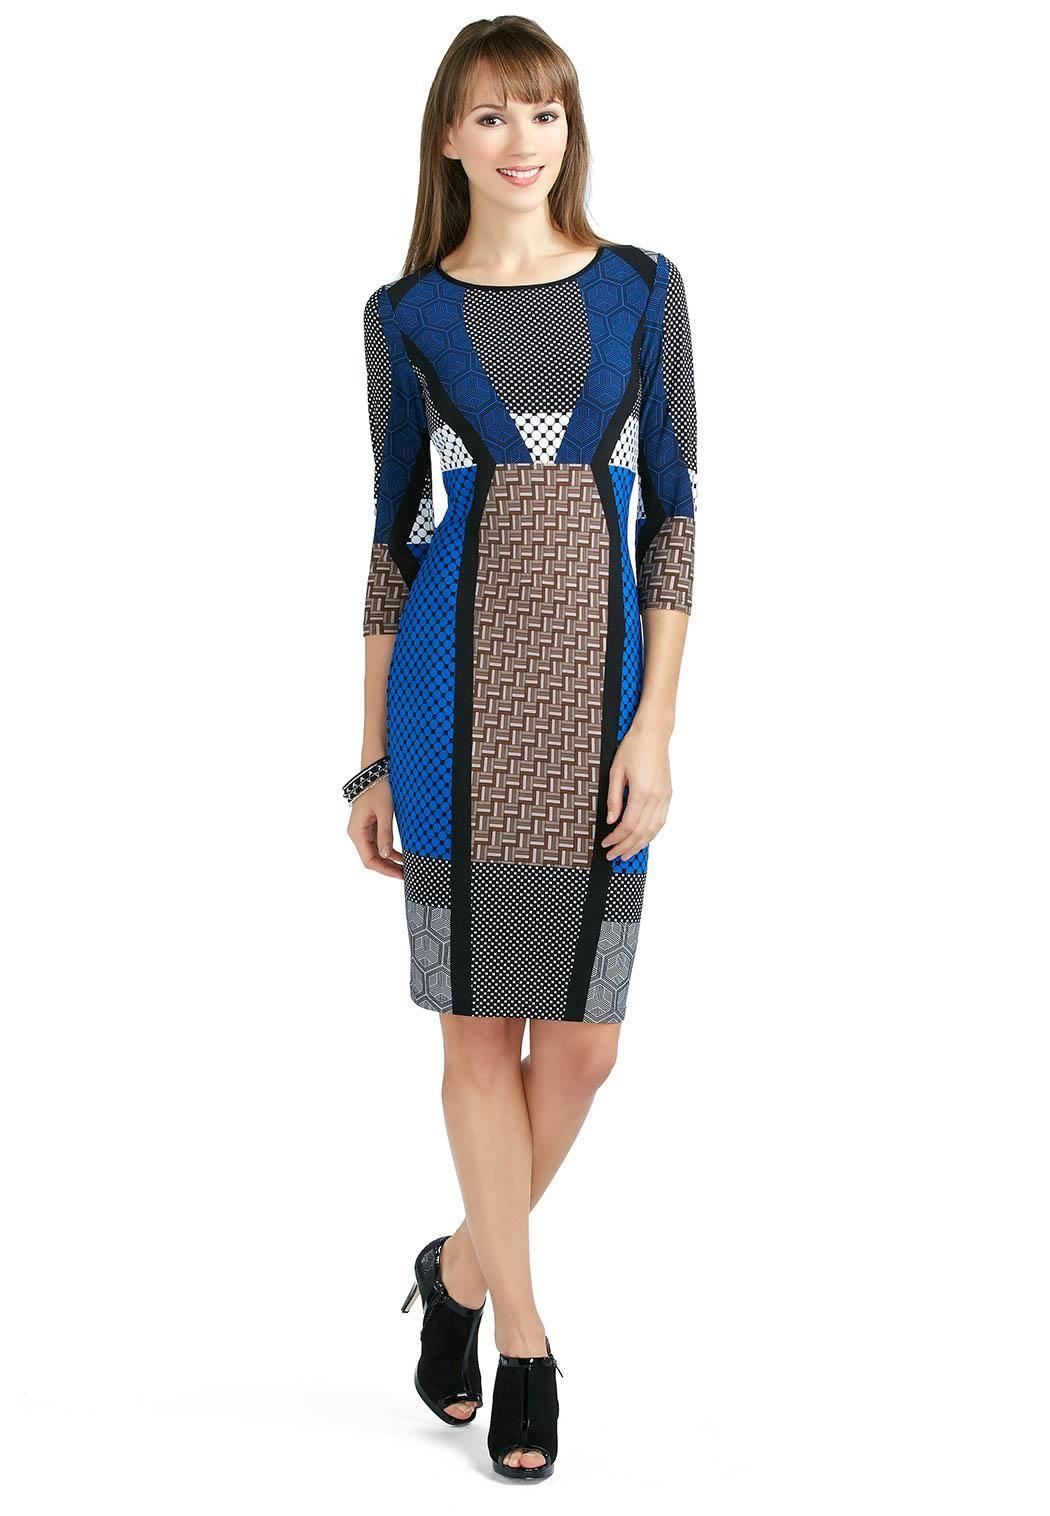 Cato Fashion Plus Size Dresses | Feeling Inspired Beads